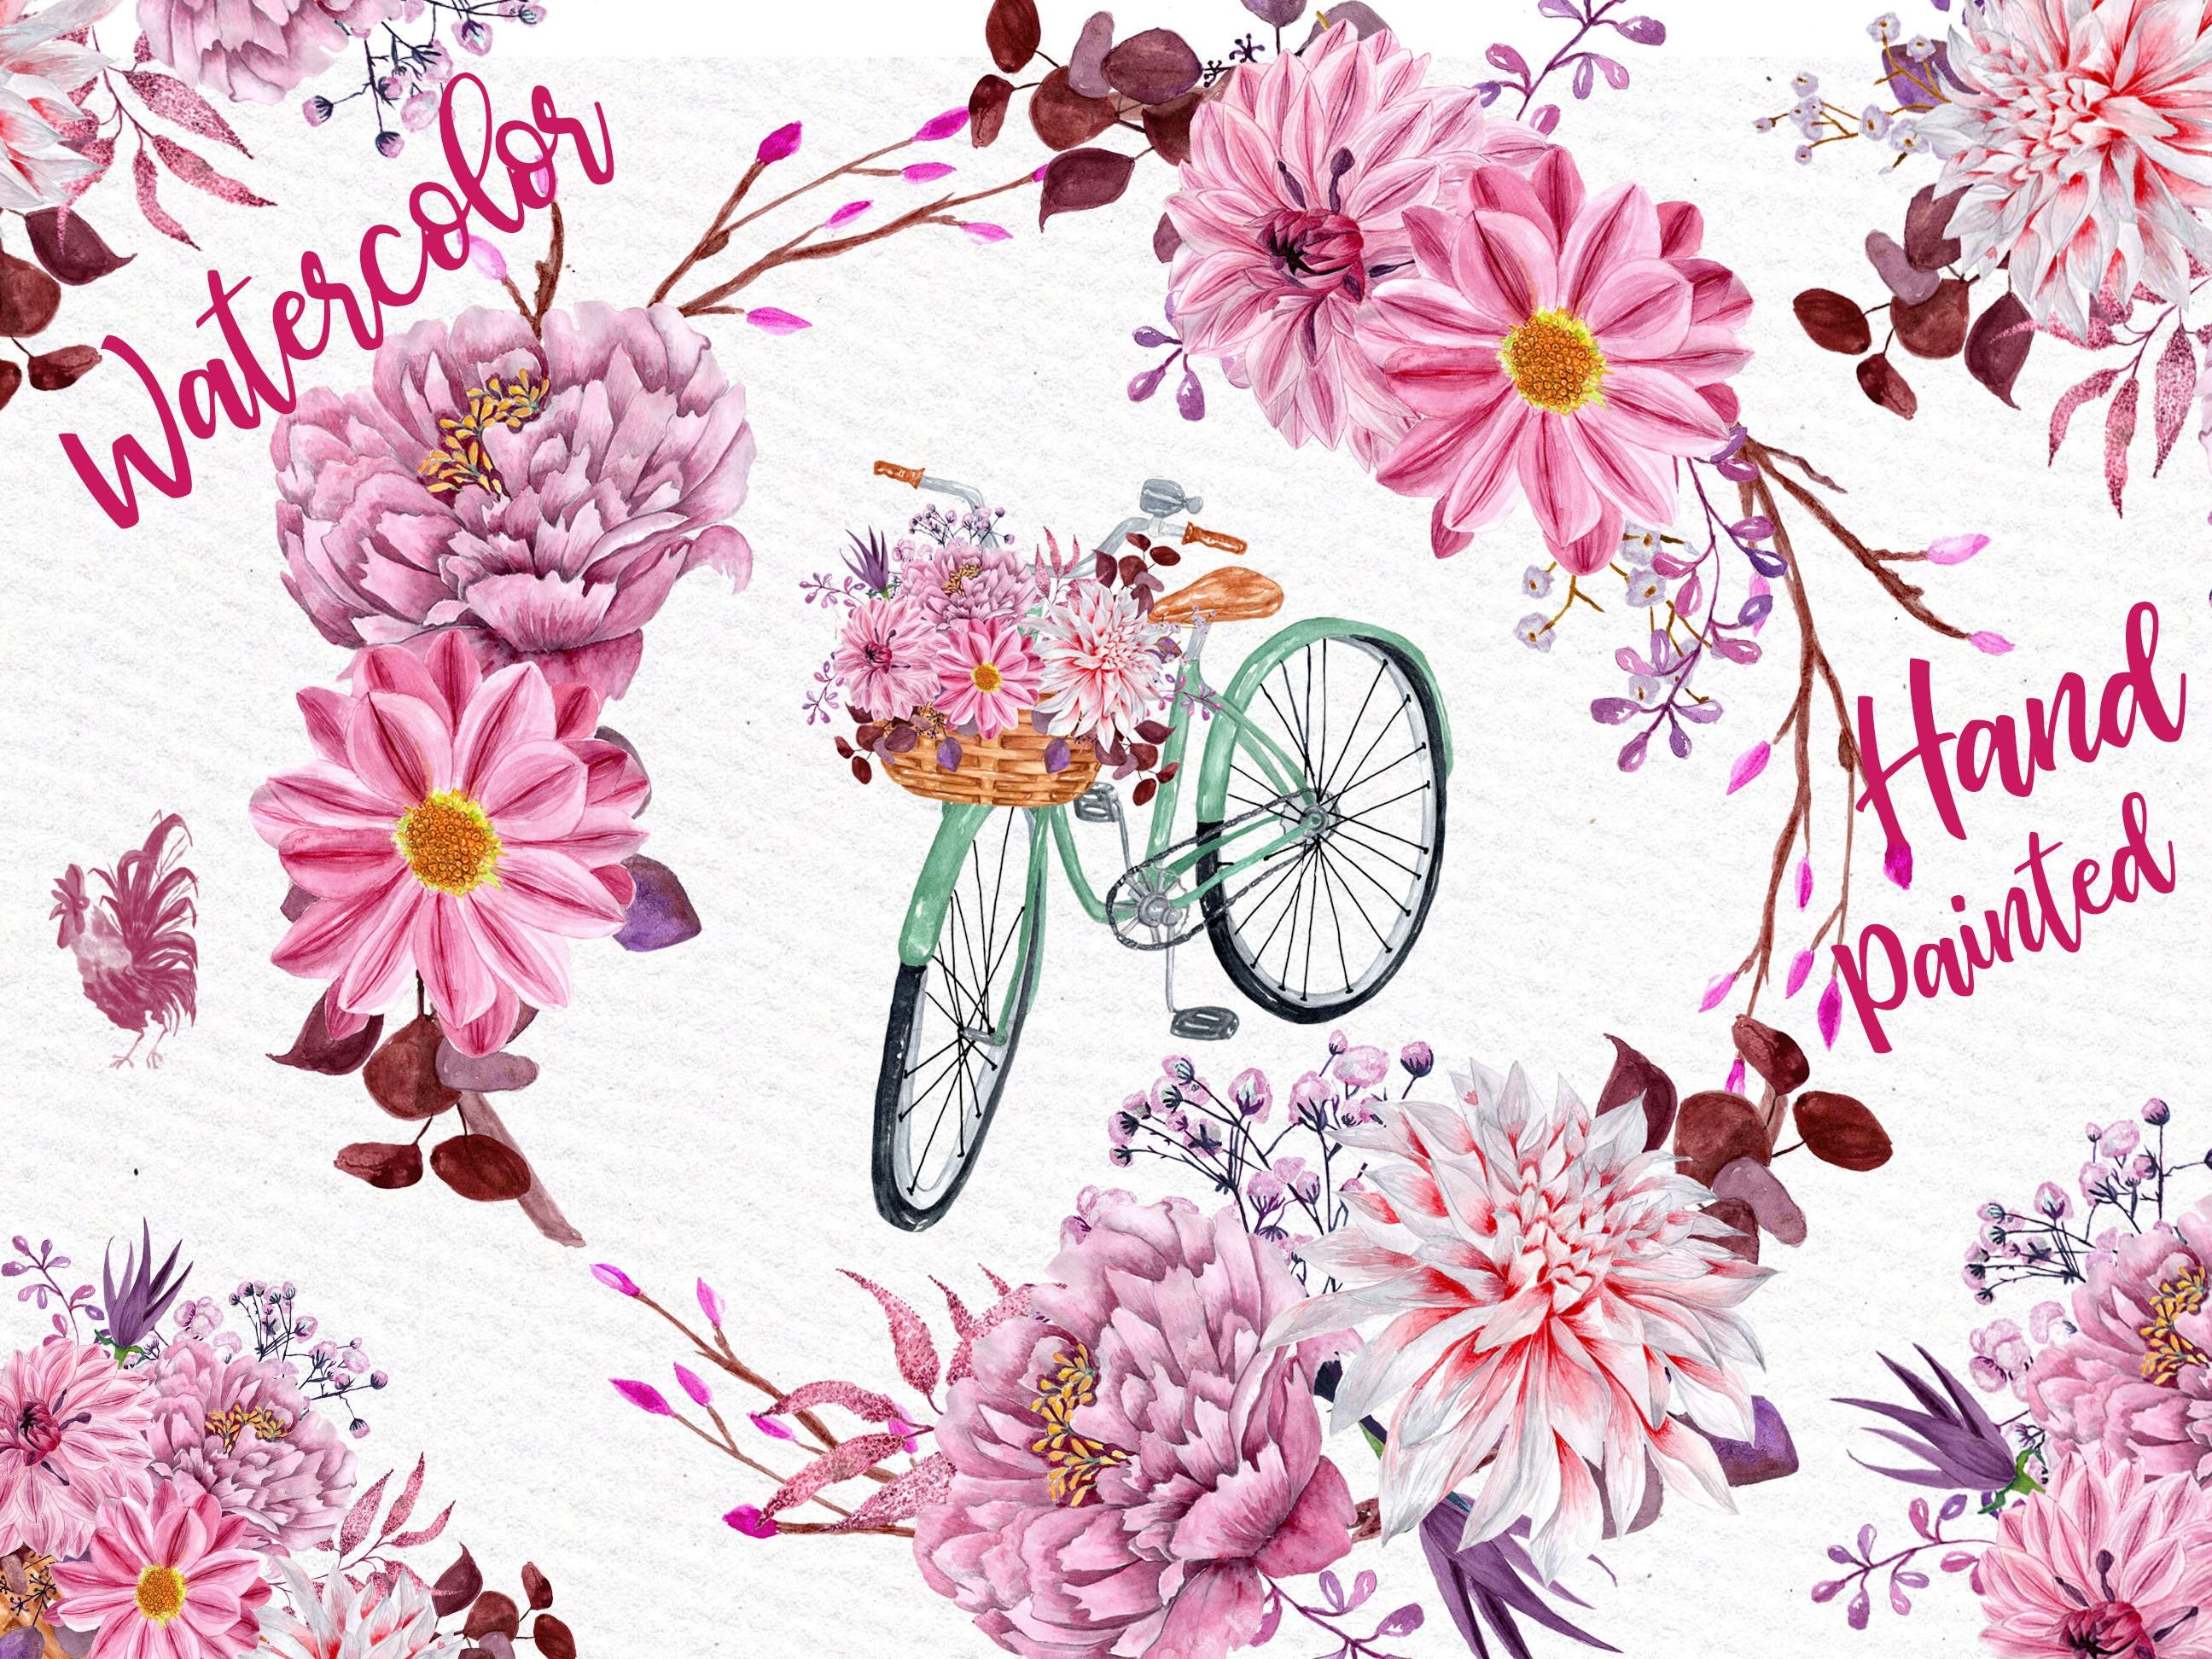 Watercolor flowers clipart: FLORAL CLIPART Floral | Etsy